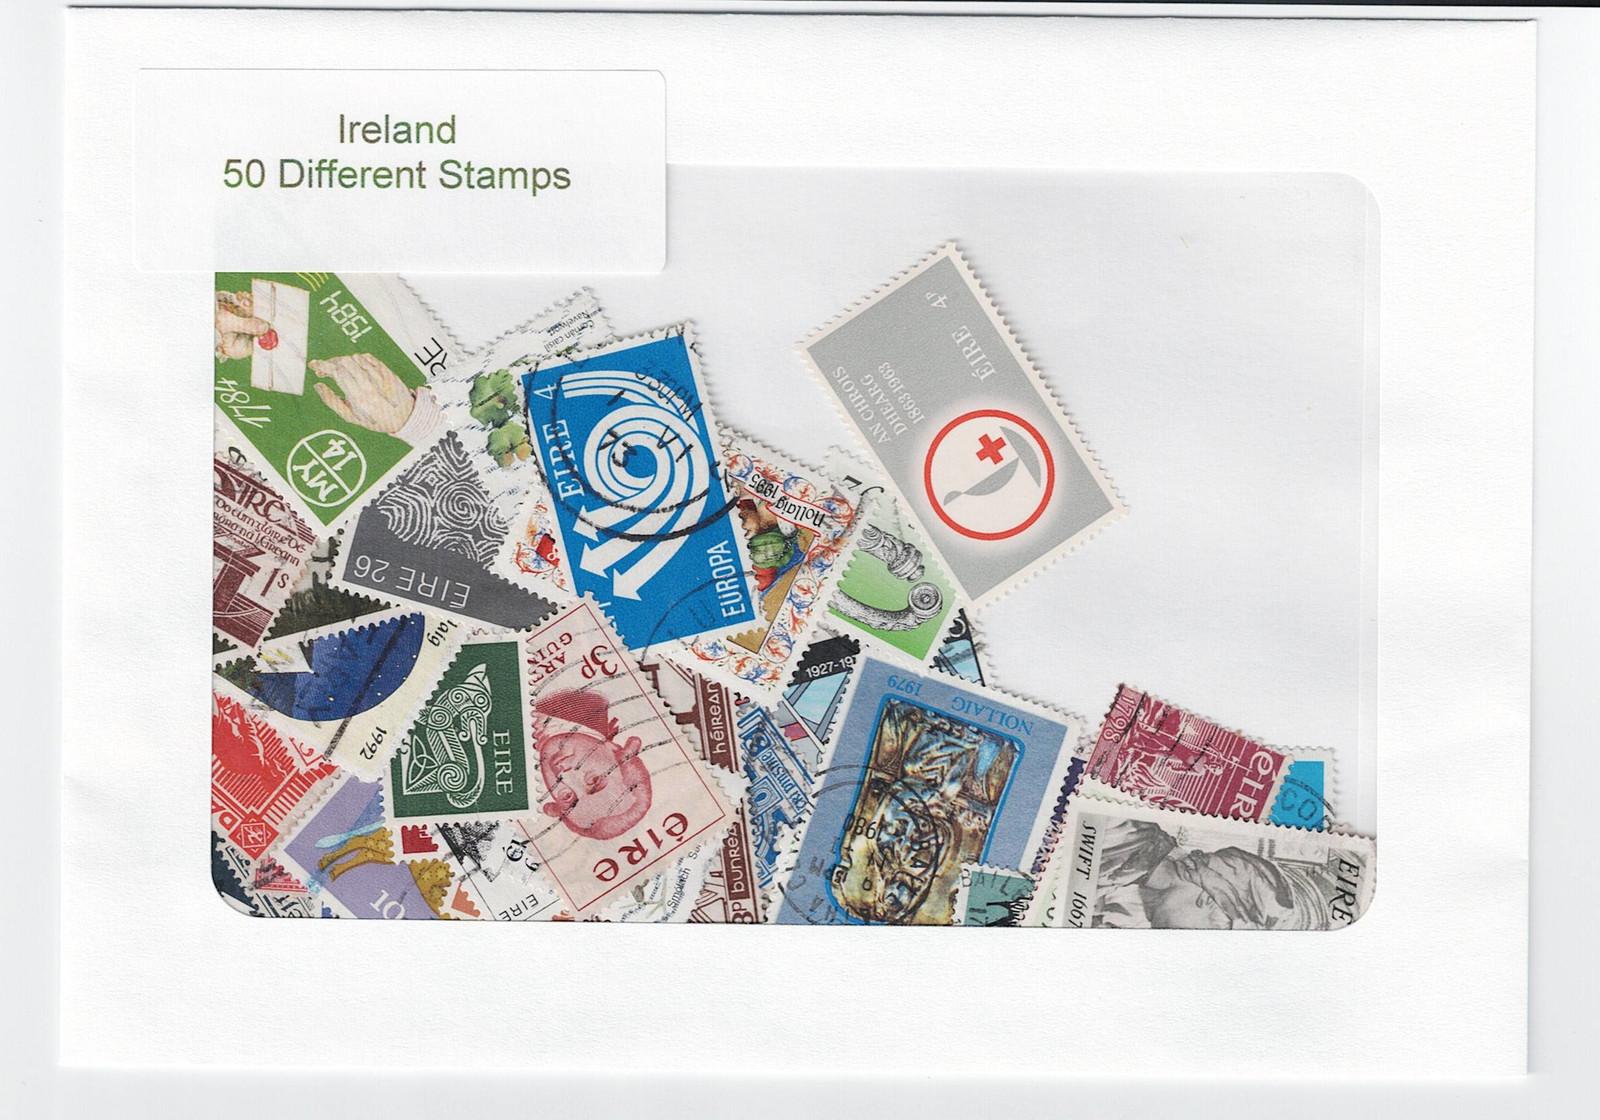 Ireland50different